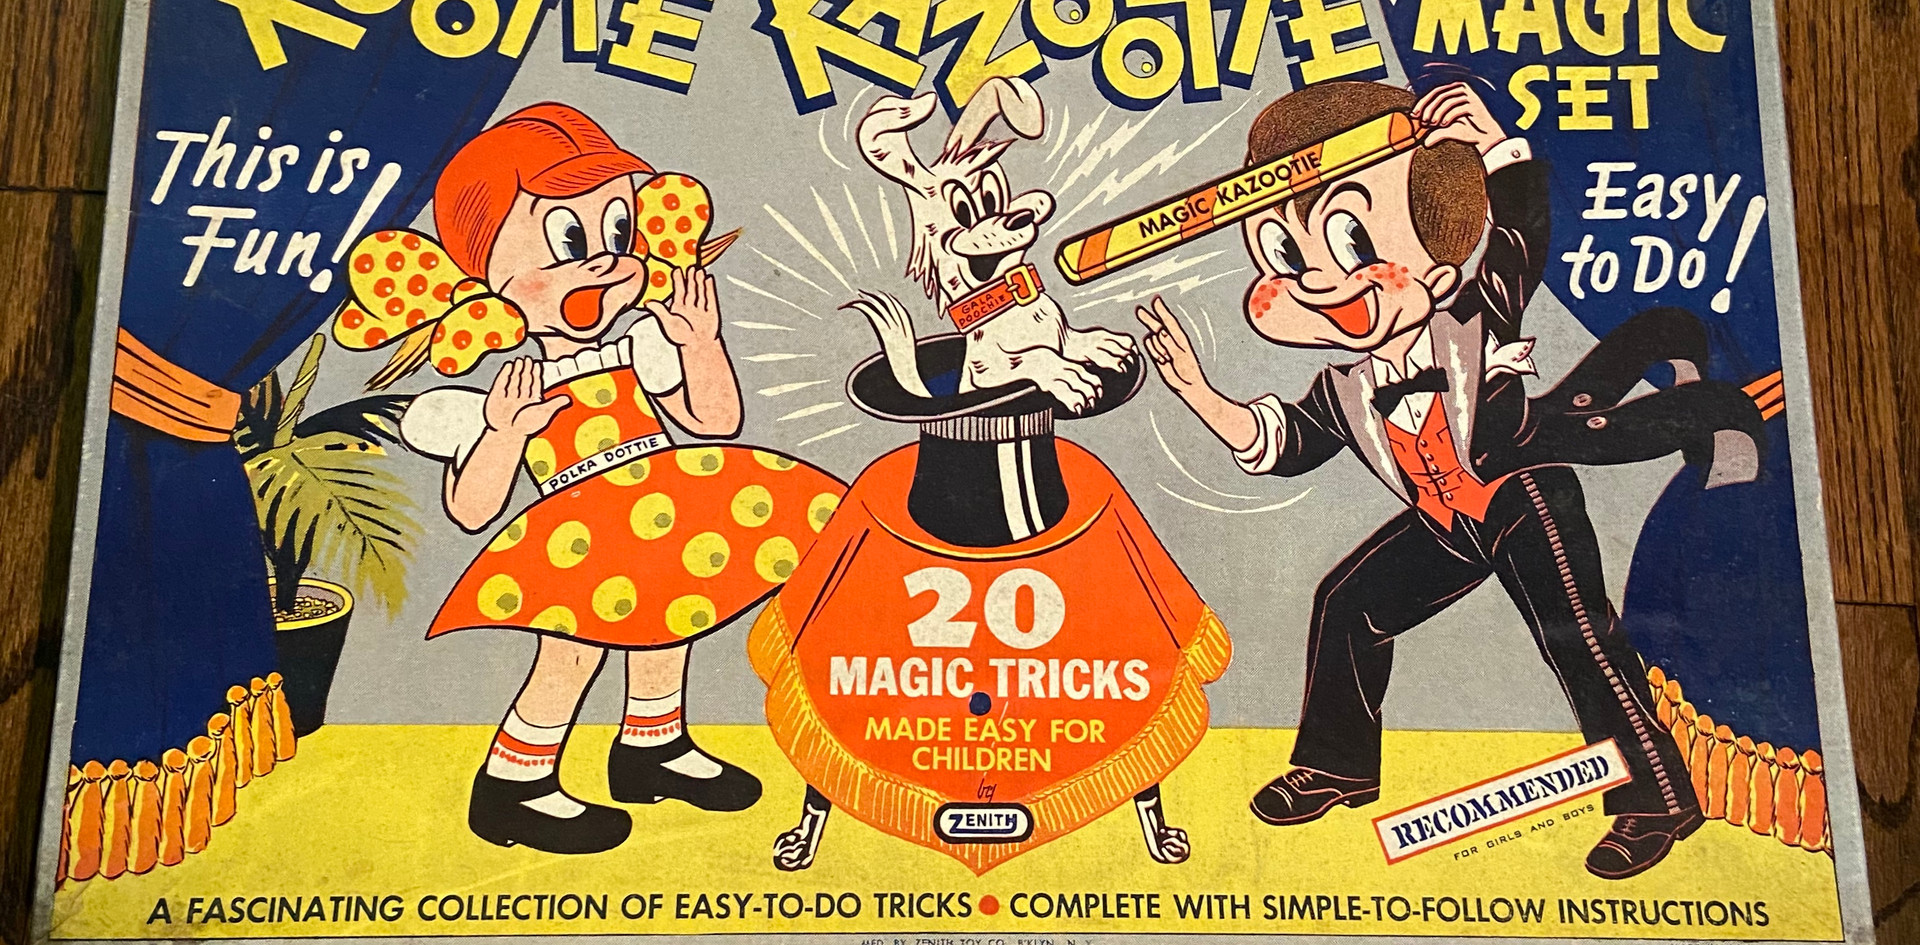 Rootie Kazootie Magic Set